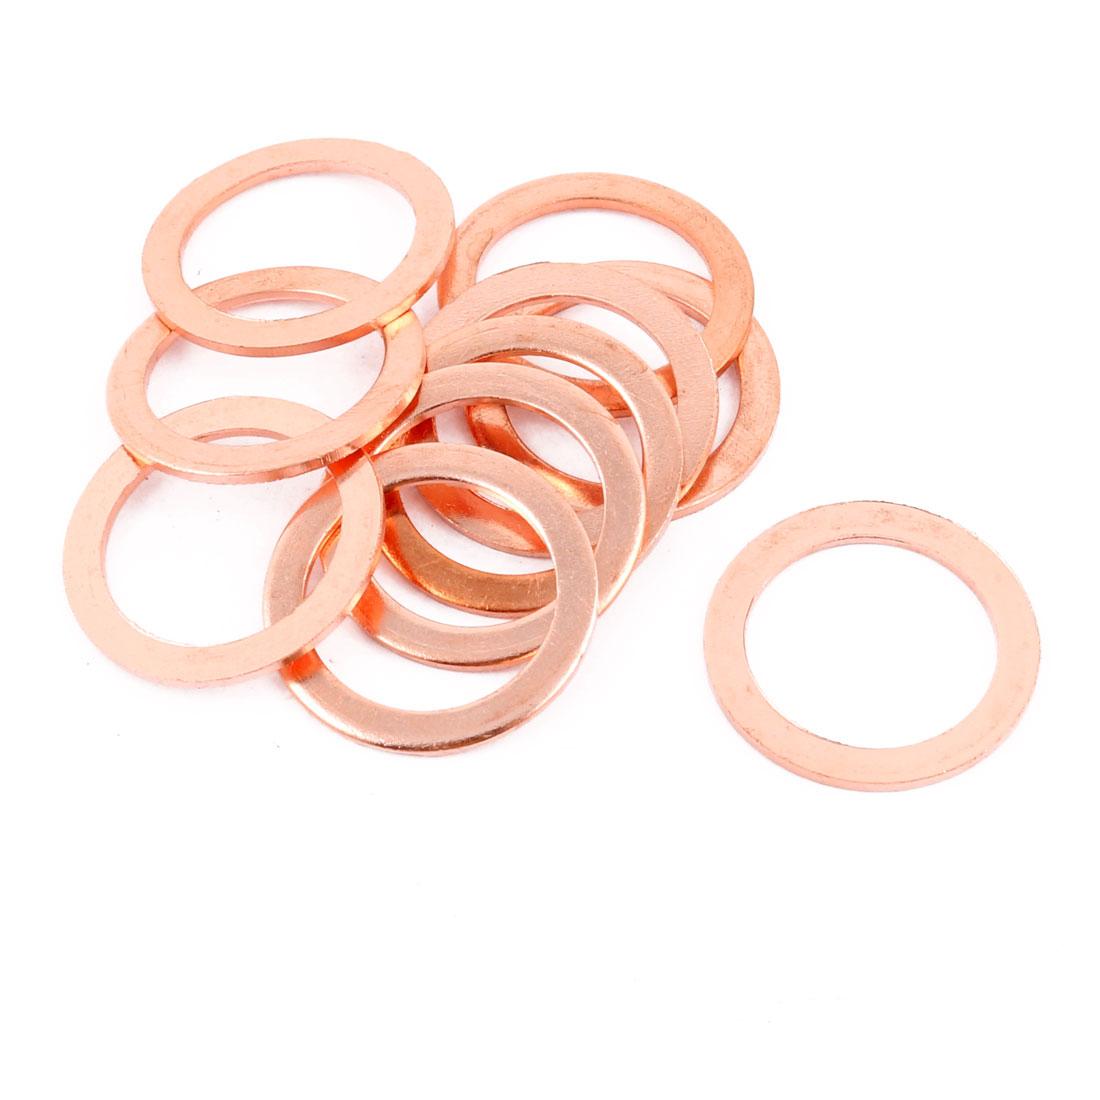 10pcs 30mm x 22mm x 2mm Flat Ring Copper Crush Washer Sealing Gasket Fastener